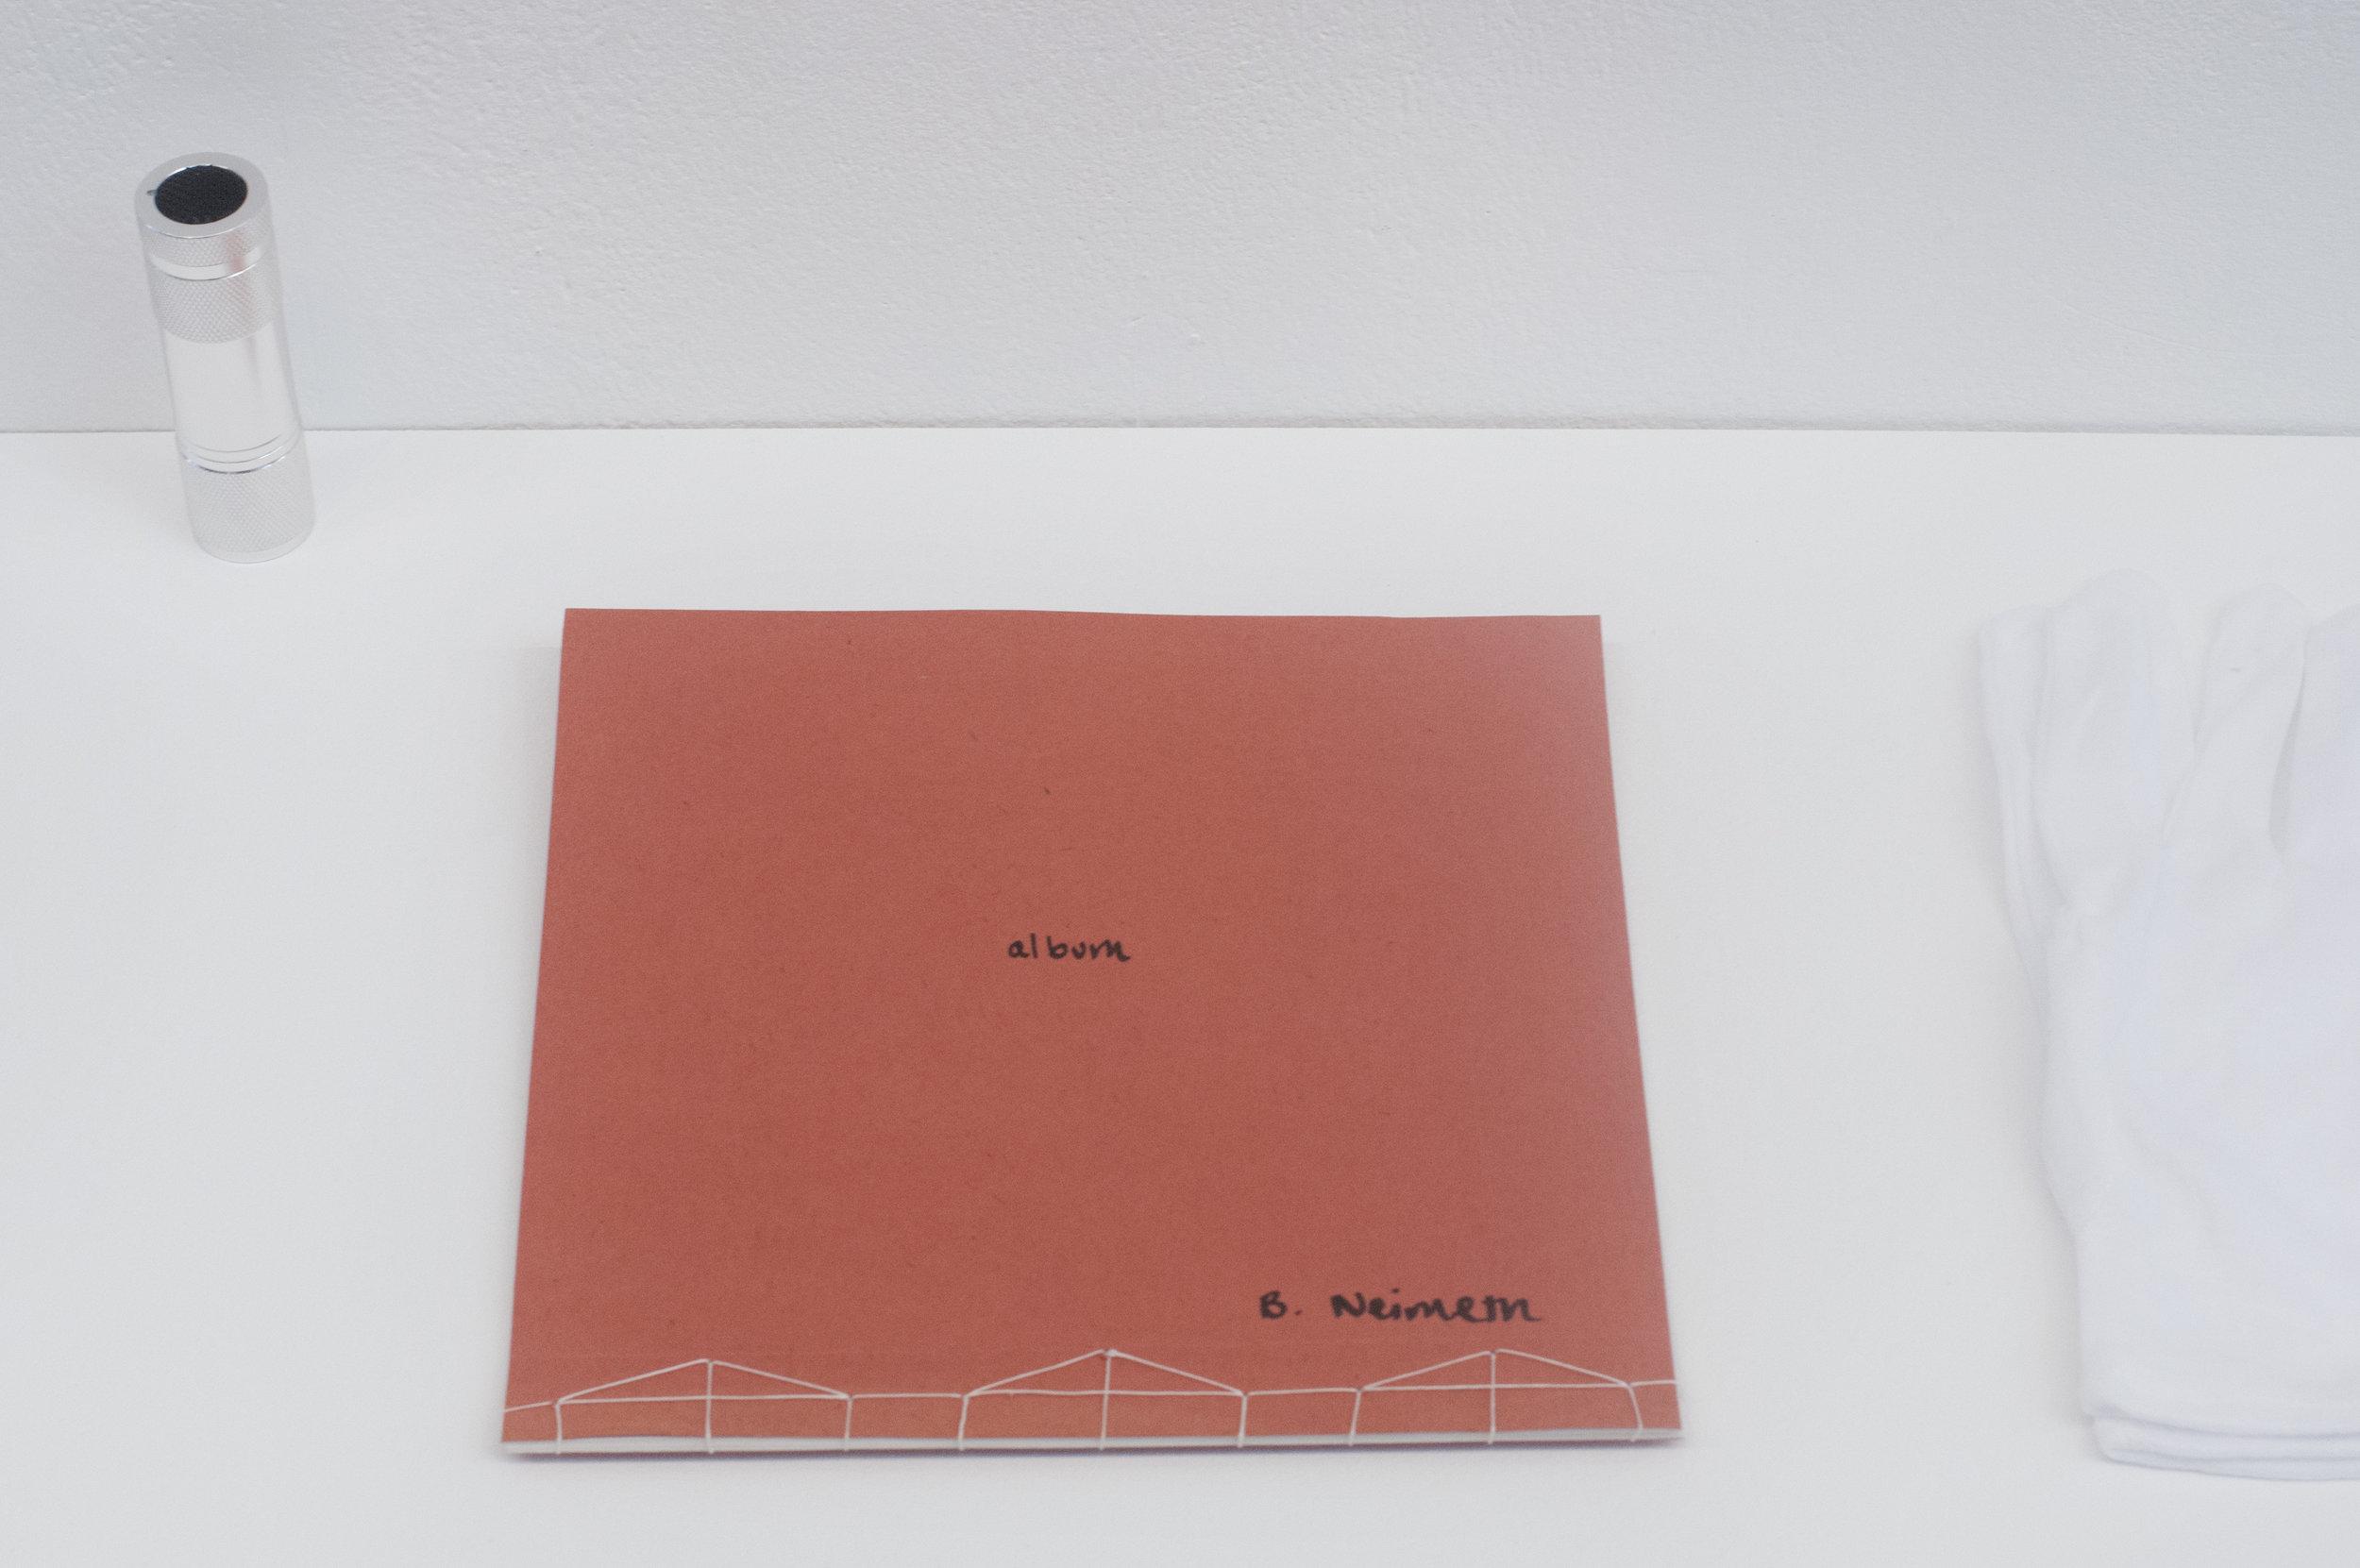 DocumentationofAlbum.jpg